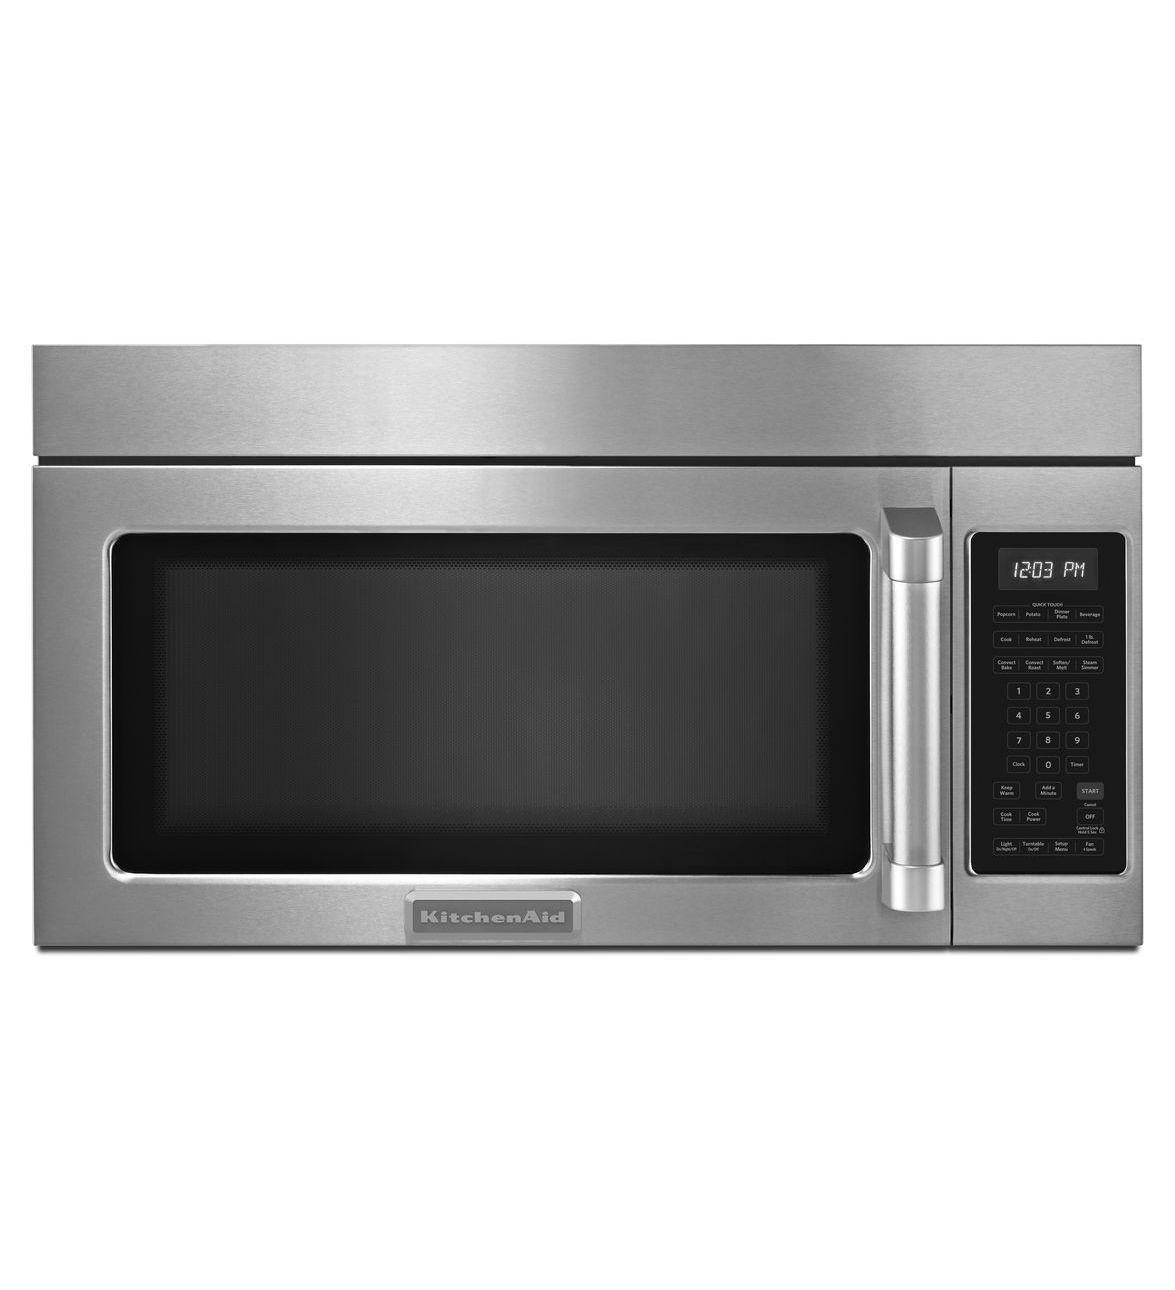 Shop Kitchenaid Architect Ii 24 In Black Stainless Steel: KitchenAid® 30'', 1000-Watt Microwave Hood Combination Oven, Architect® Series II (KHMC1857BSP